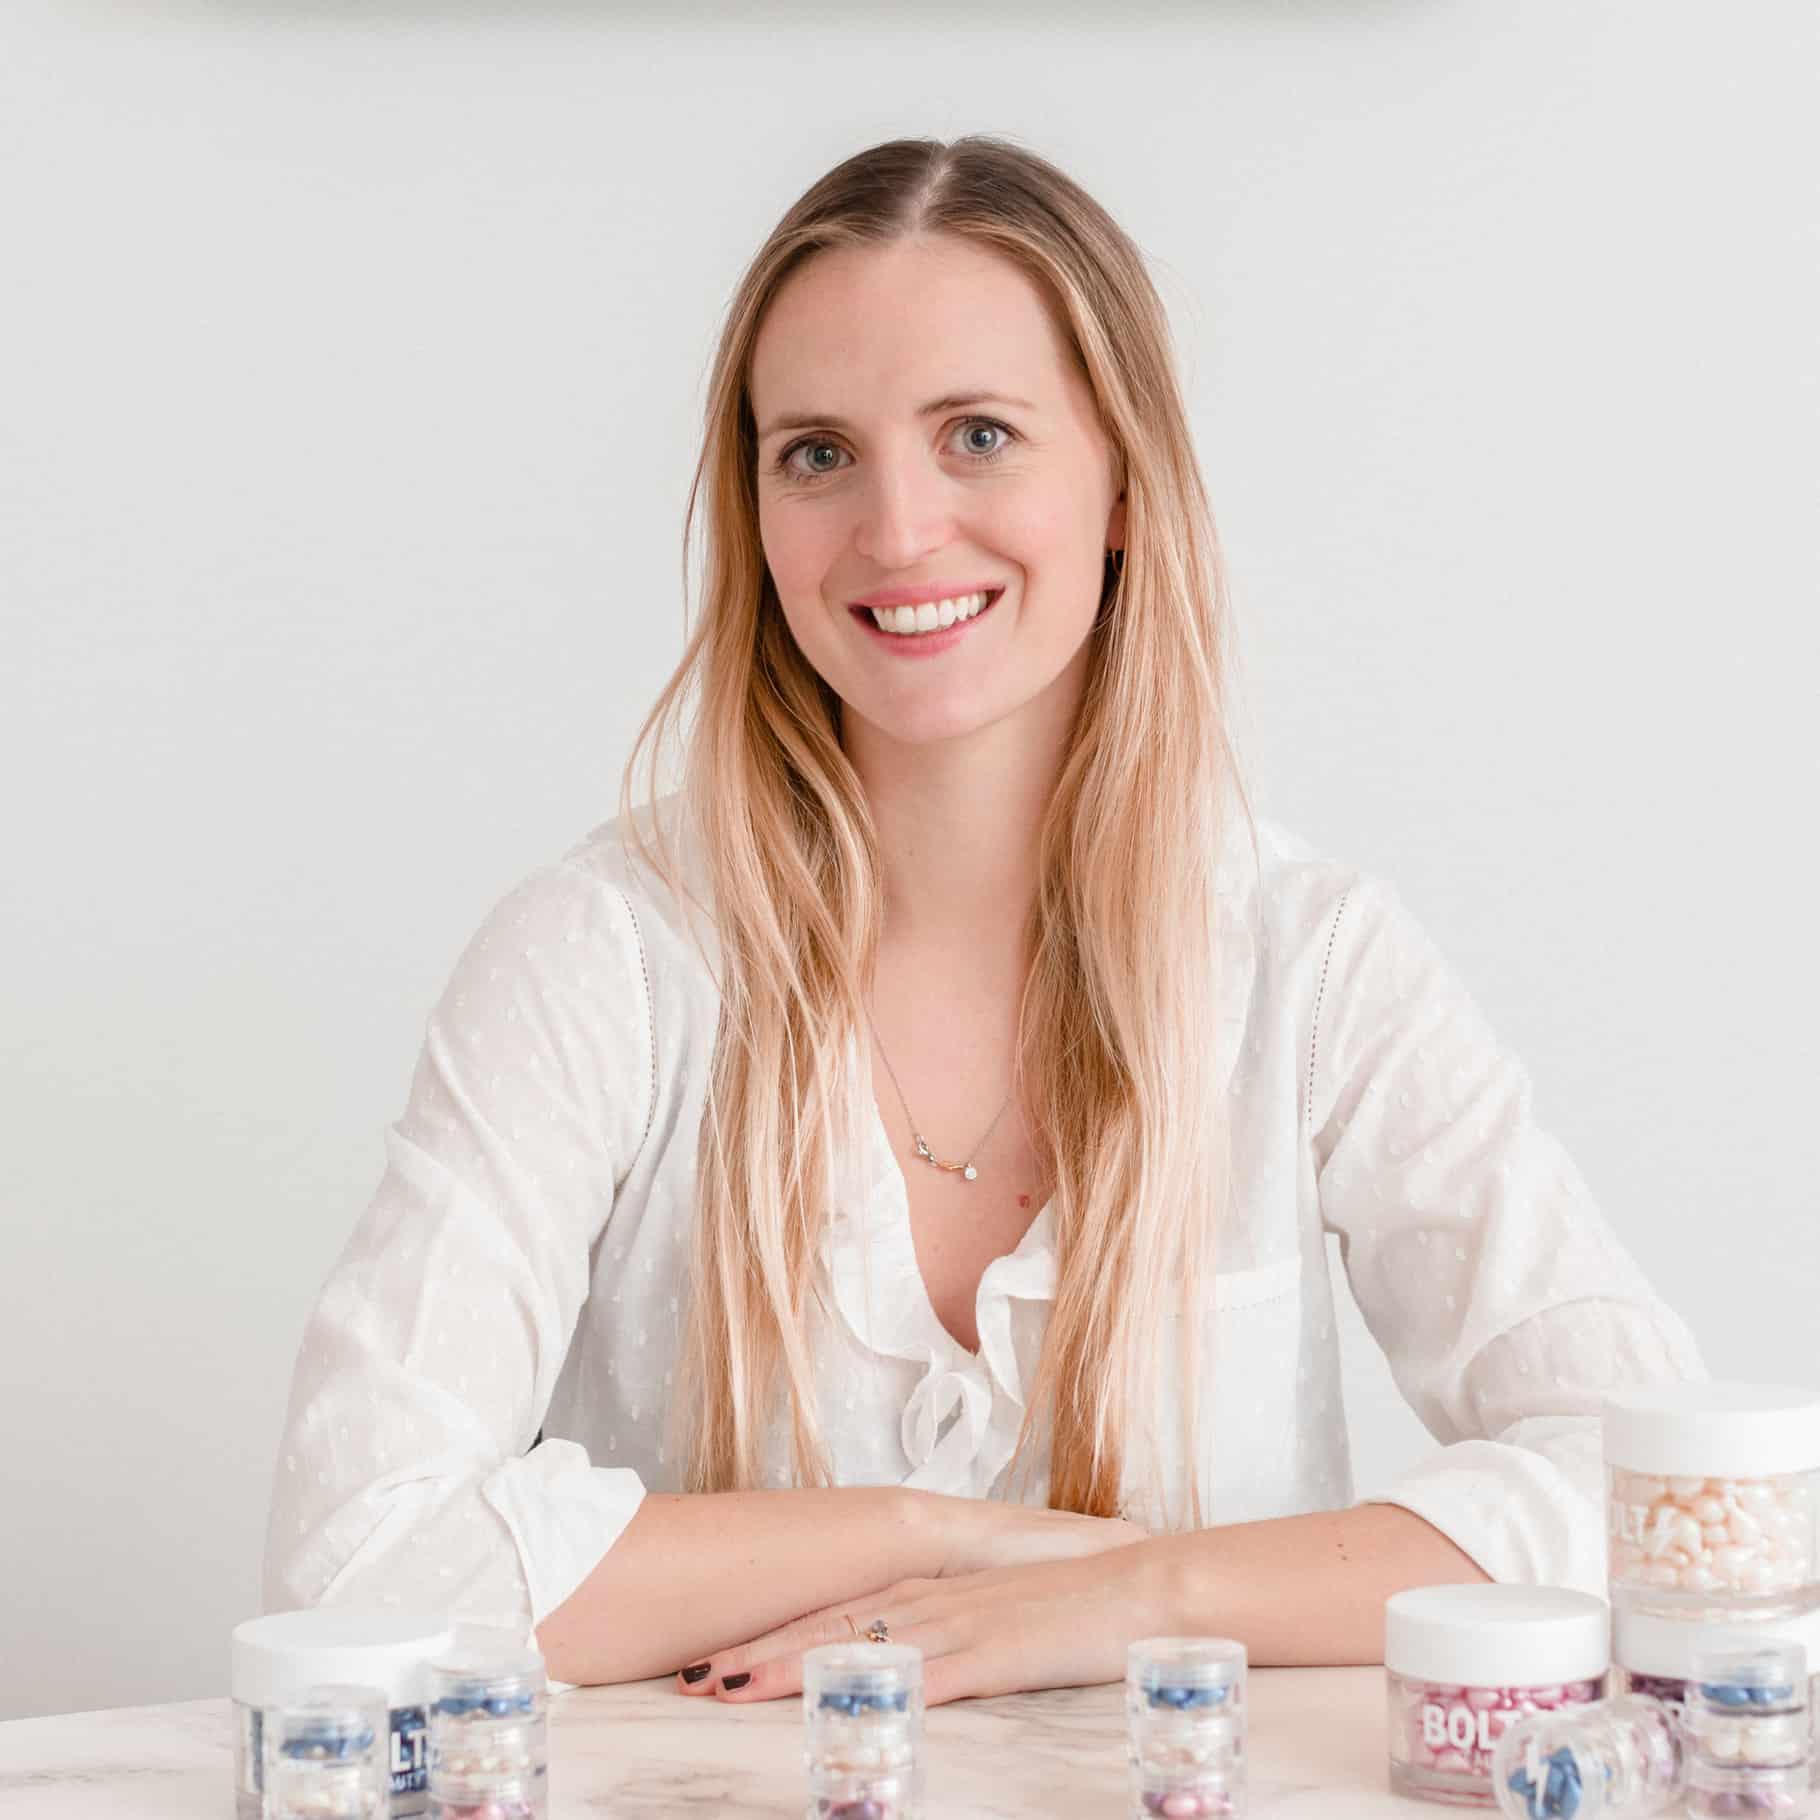 Lisa Sexton - Founder of Bolt Beauty